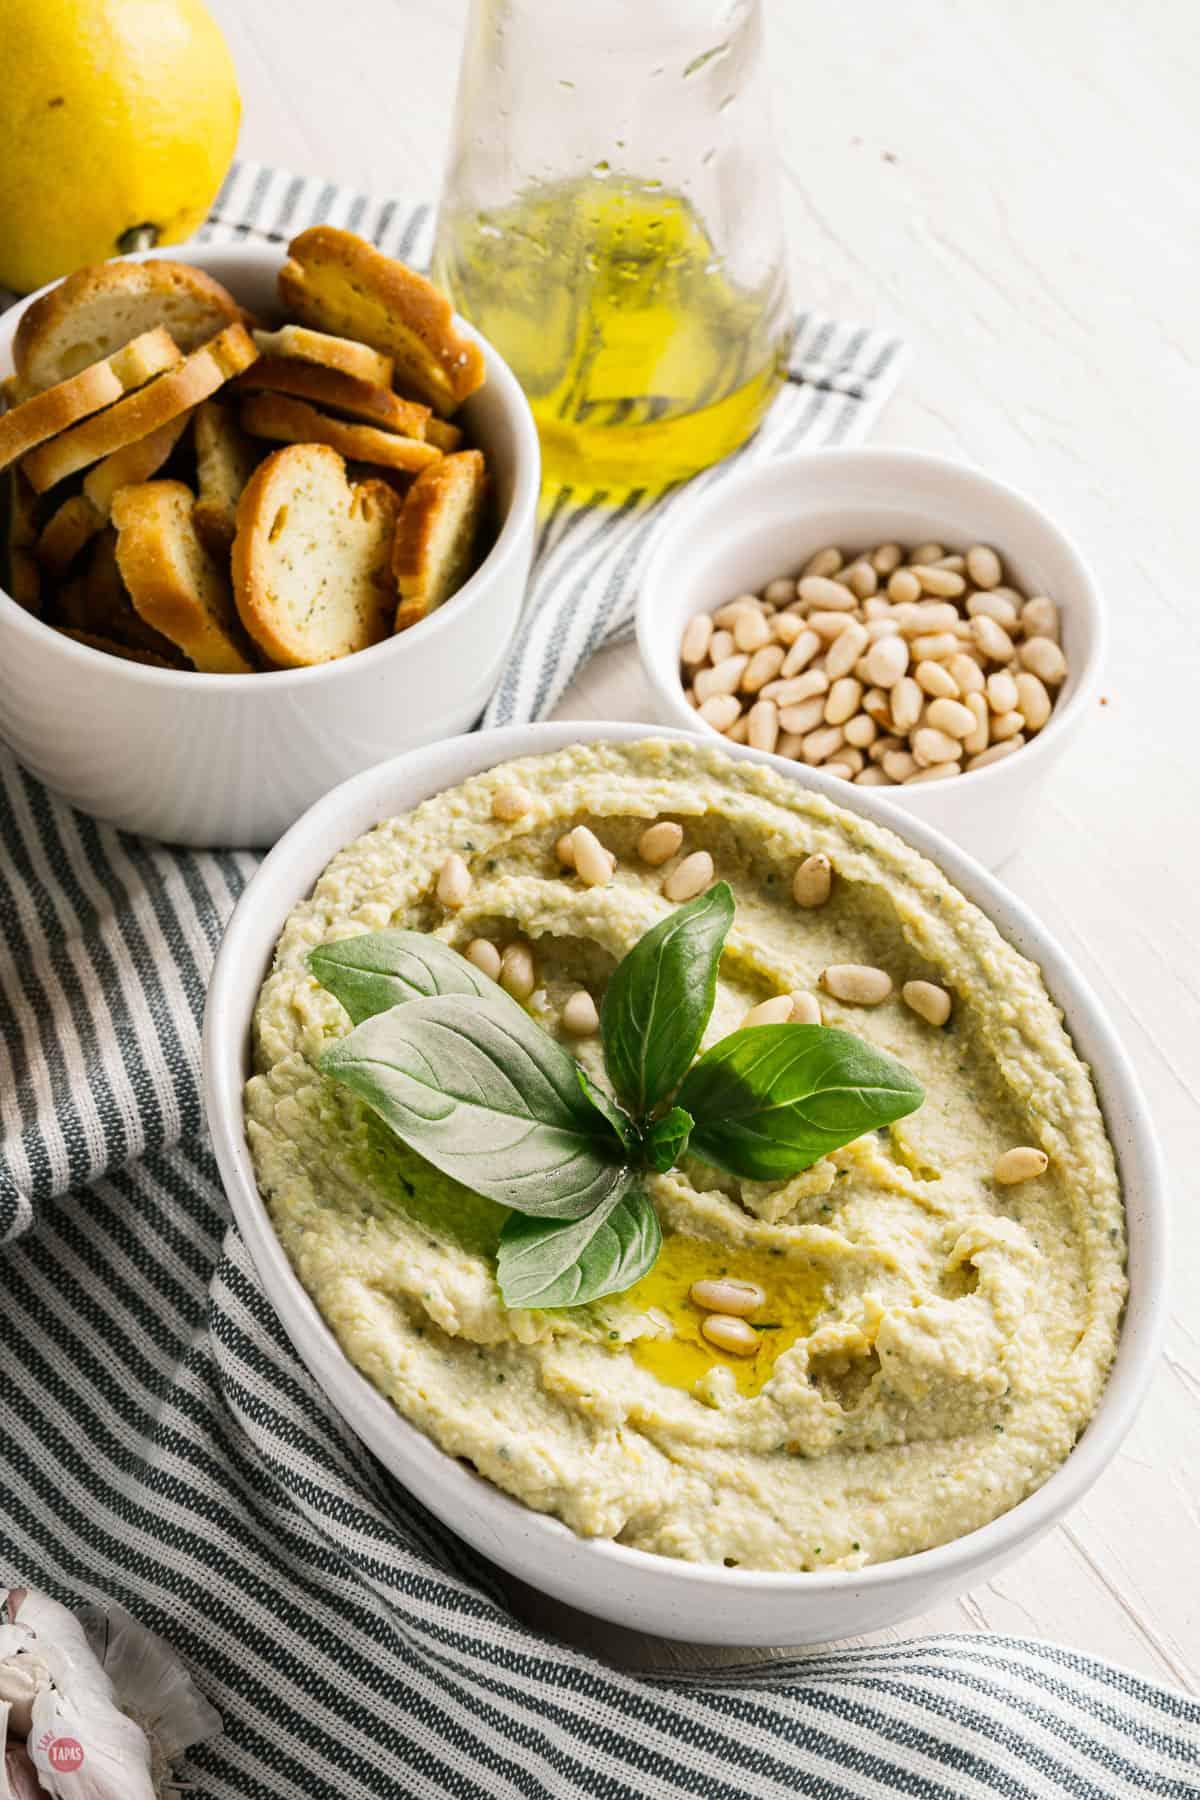 pesto hummus in a bowl